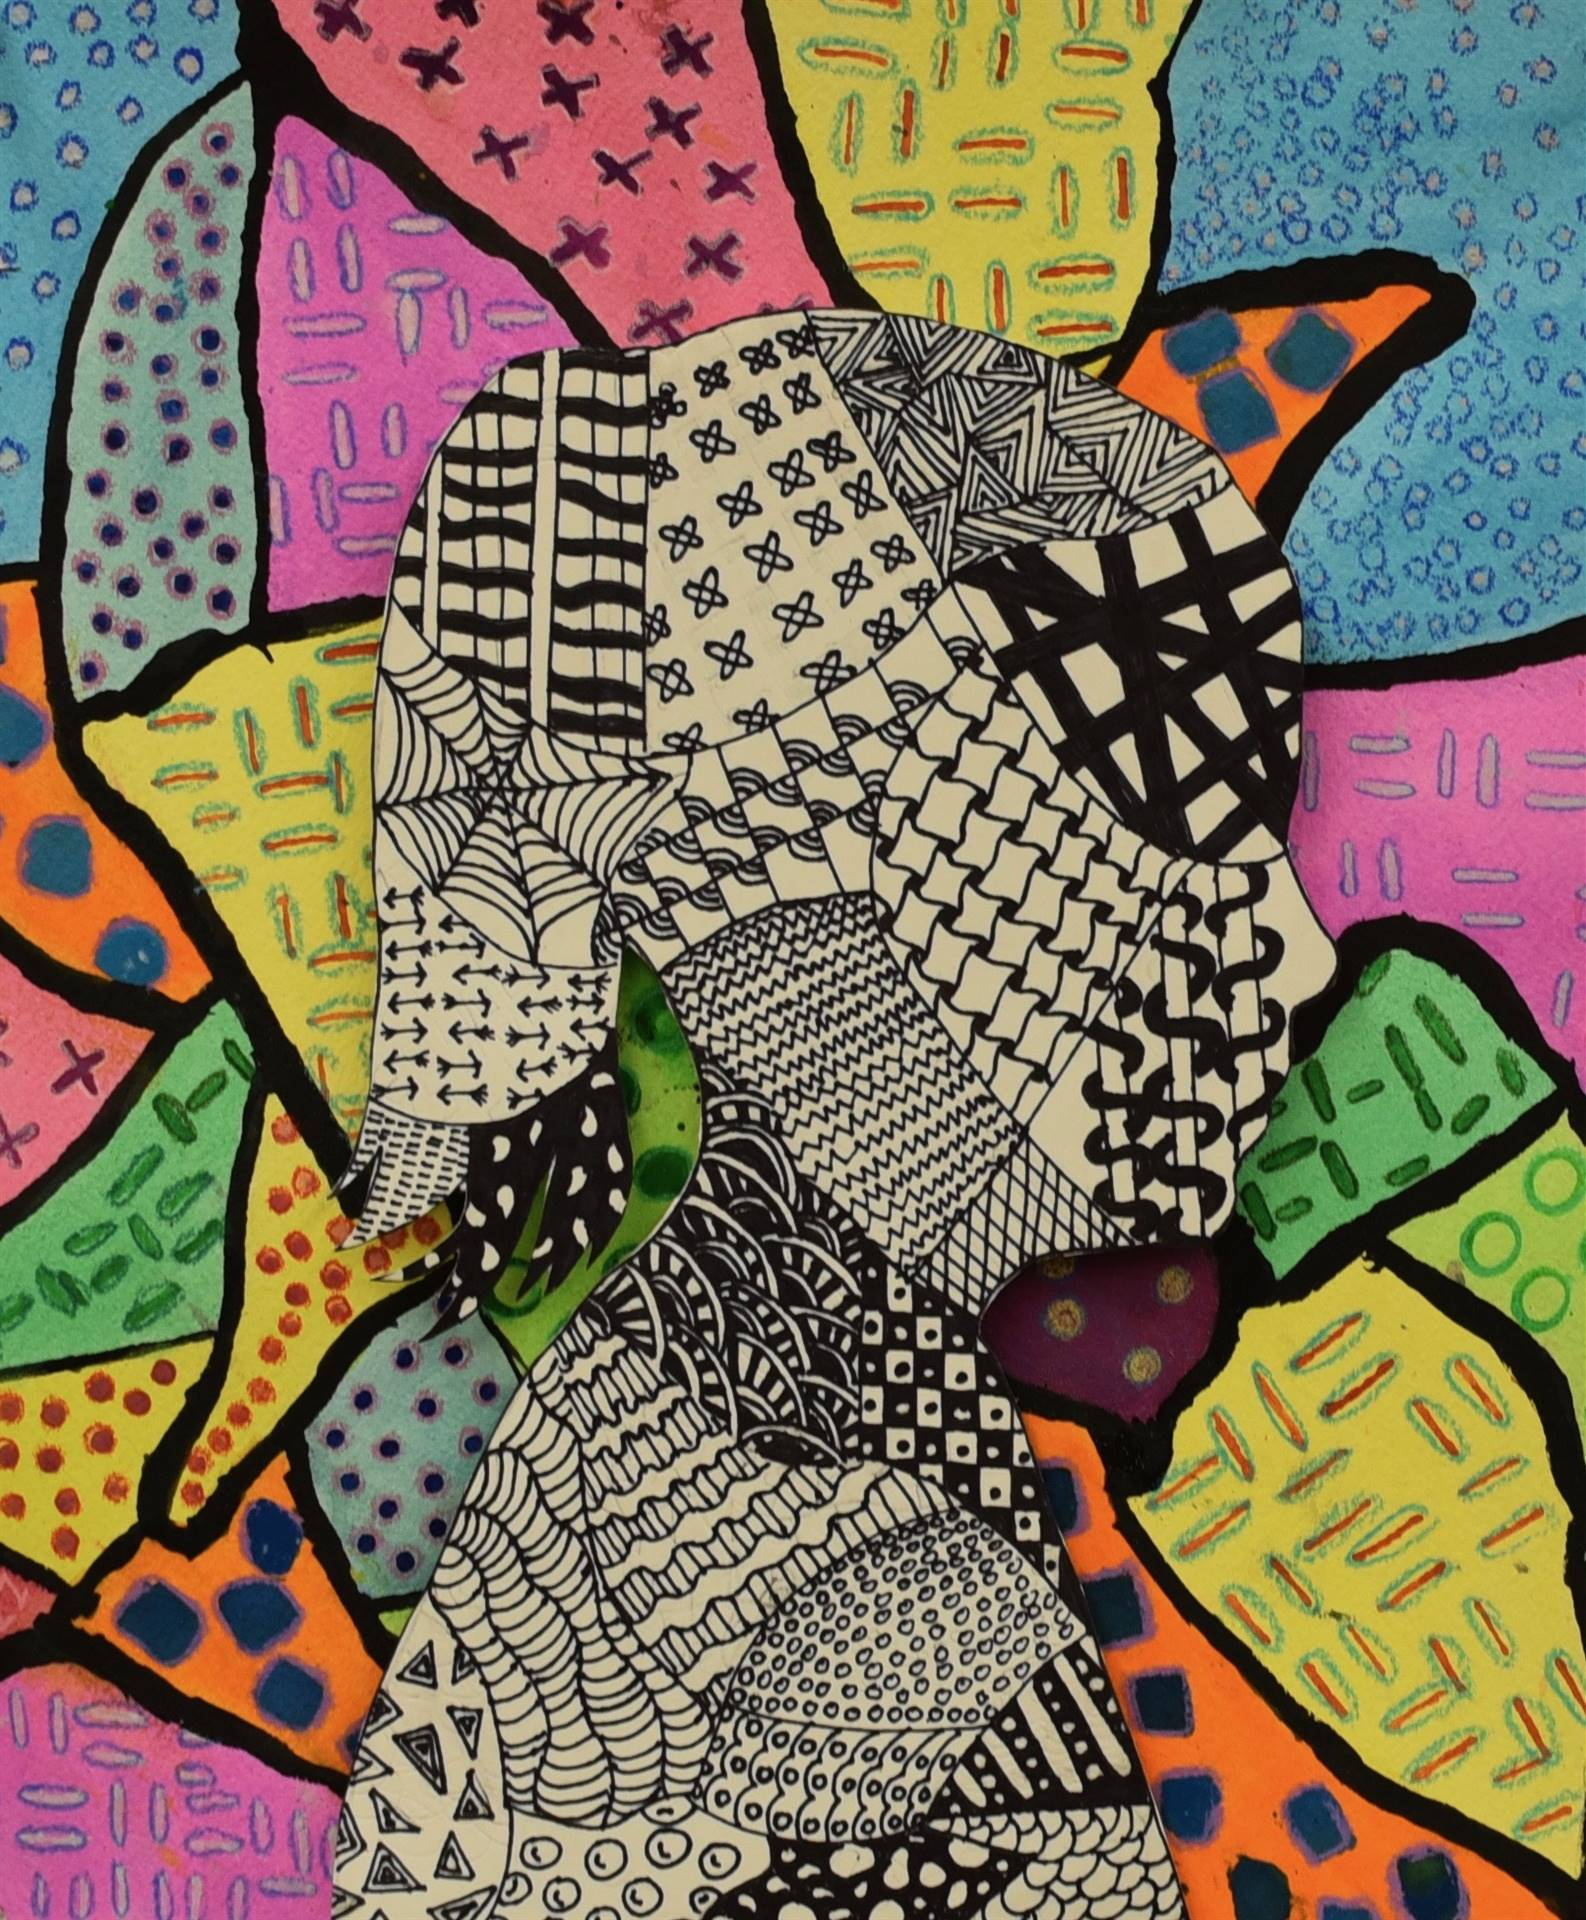 Brecksville-Broadview Hts. Middle School Art Projects 33